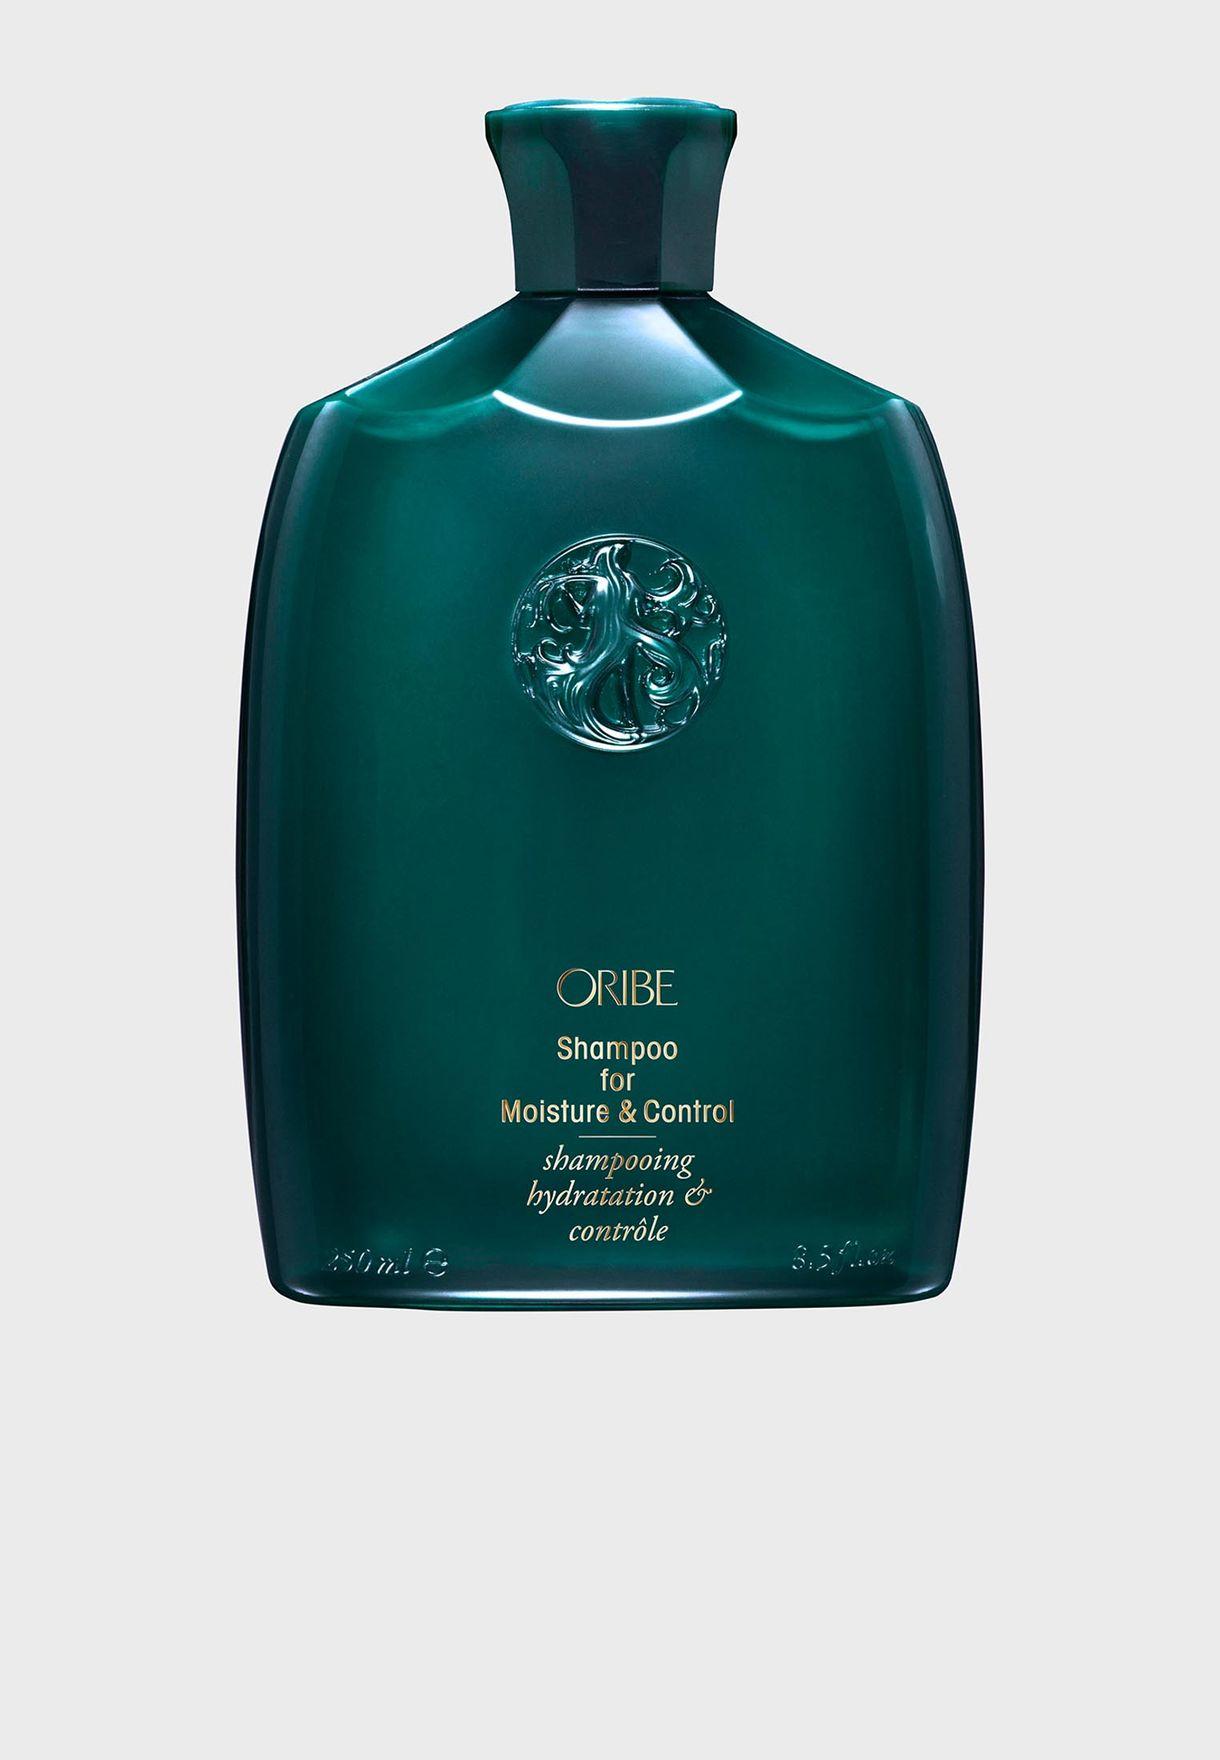 Moisture & Control Shampoo